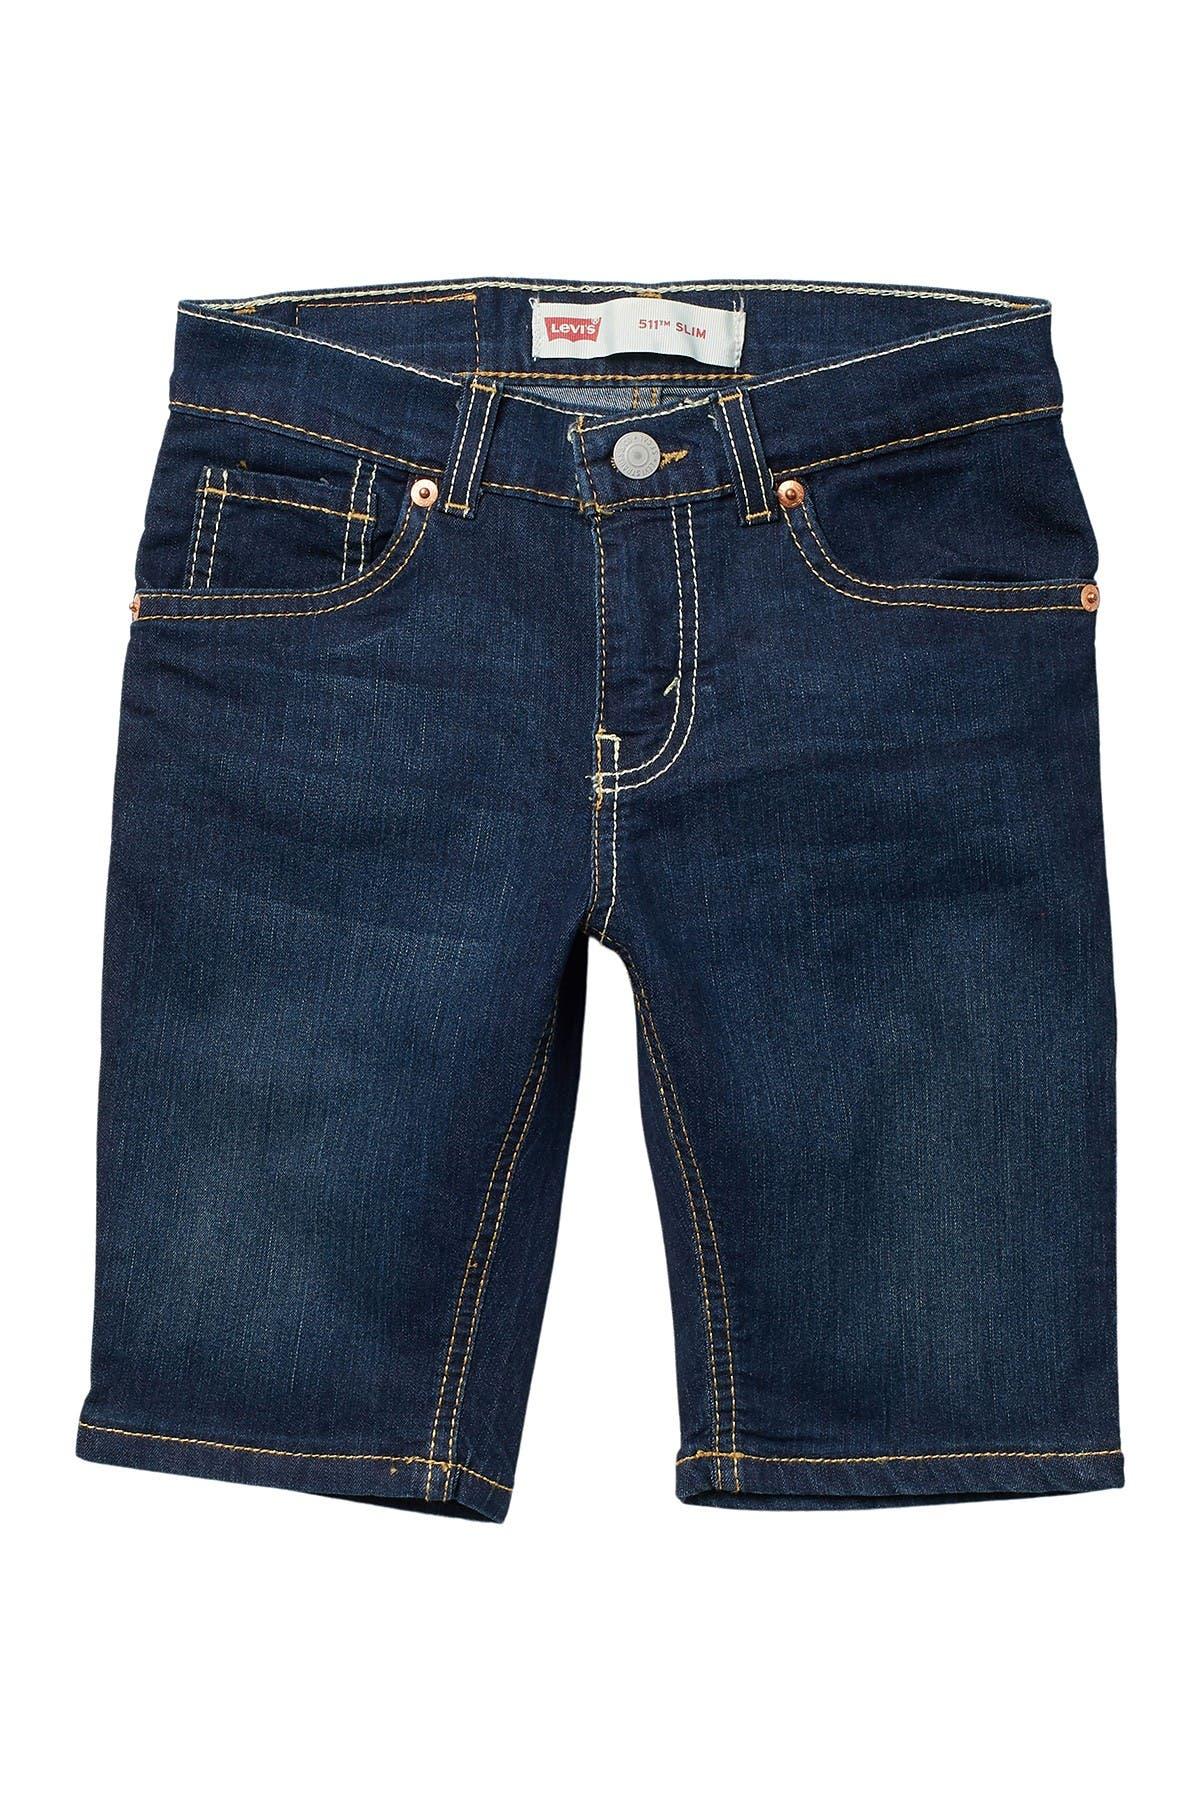 Image of Levi's Lightweight 511 Denim Shorts